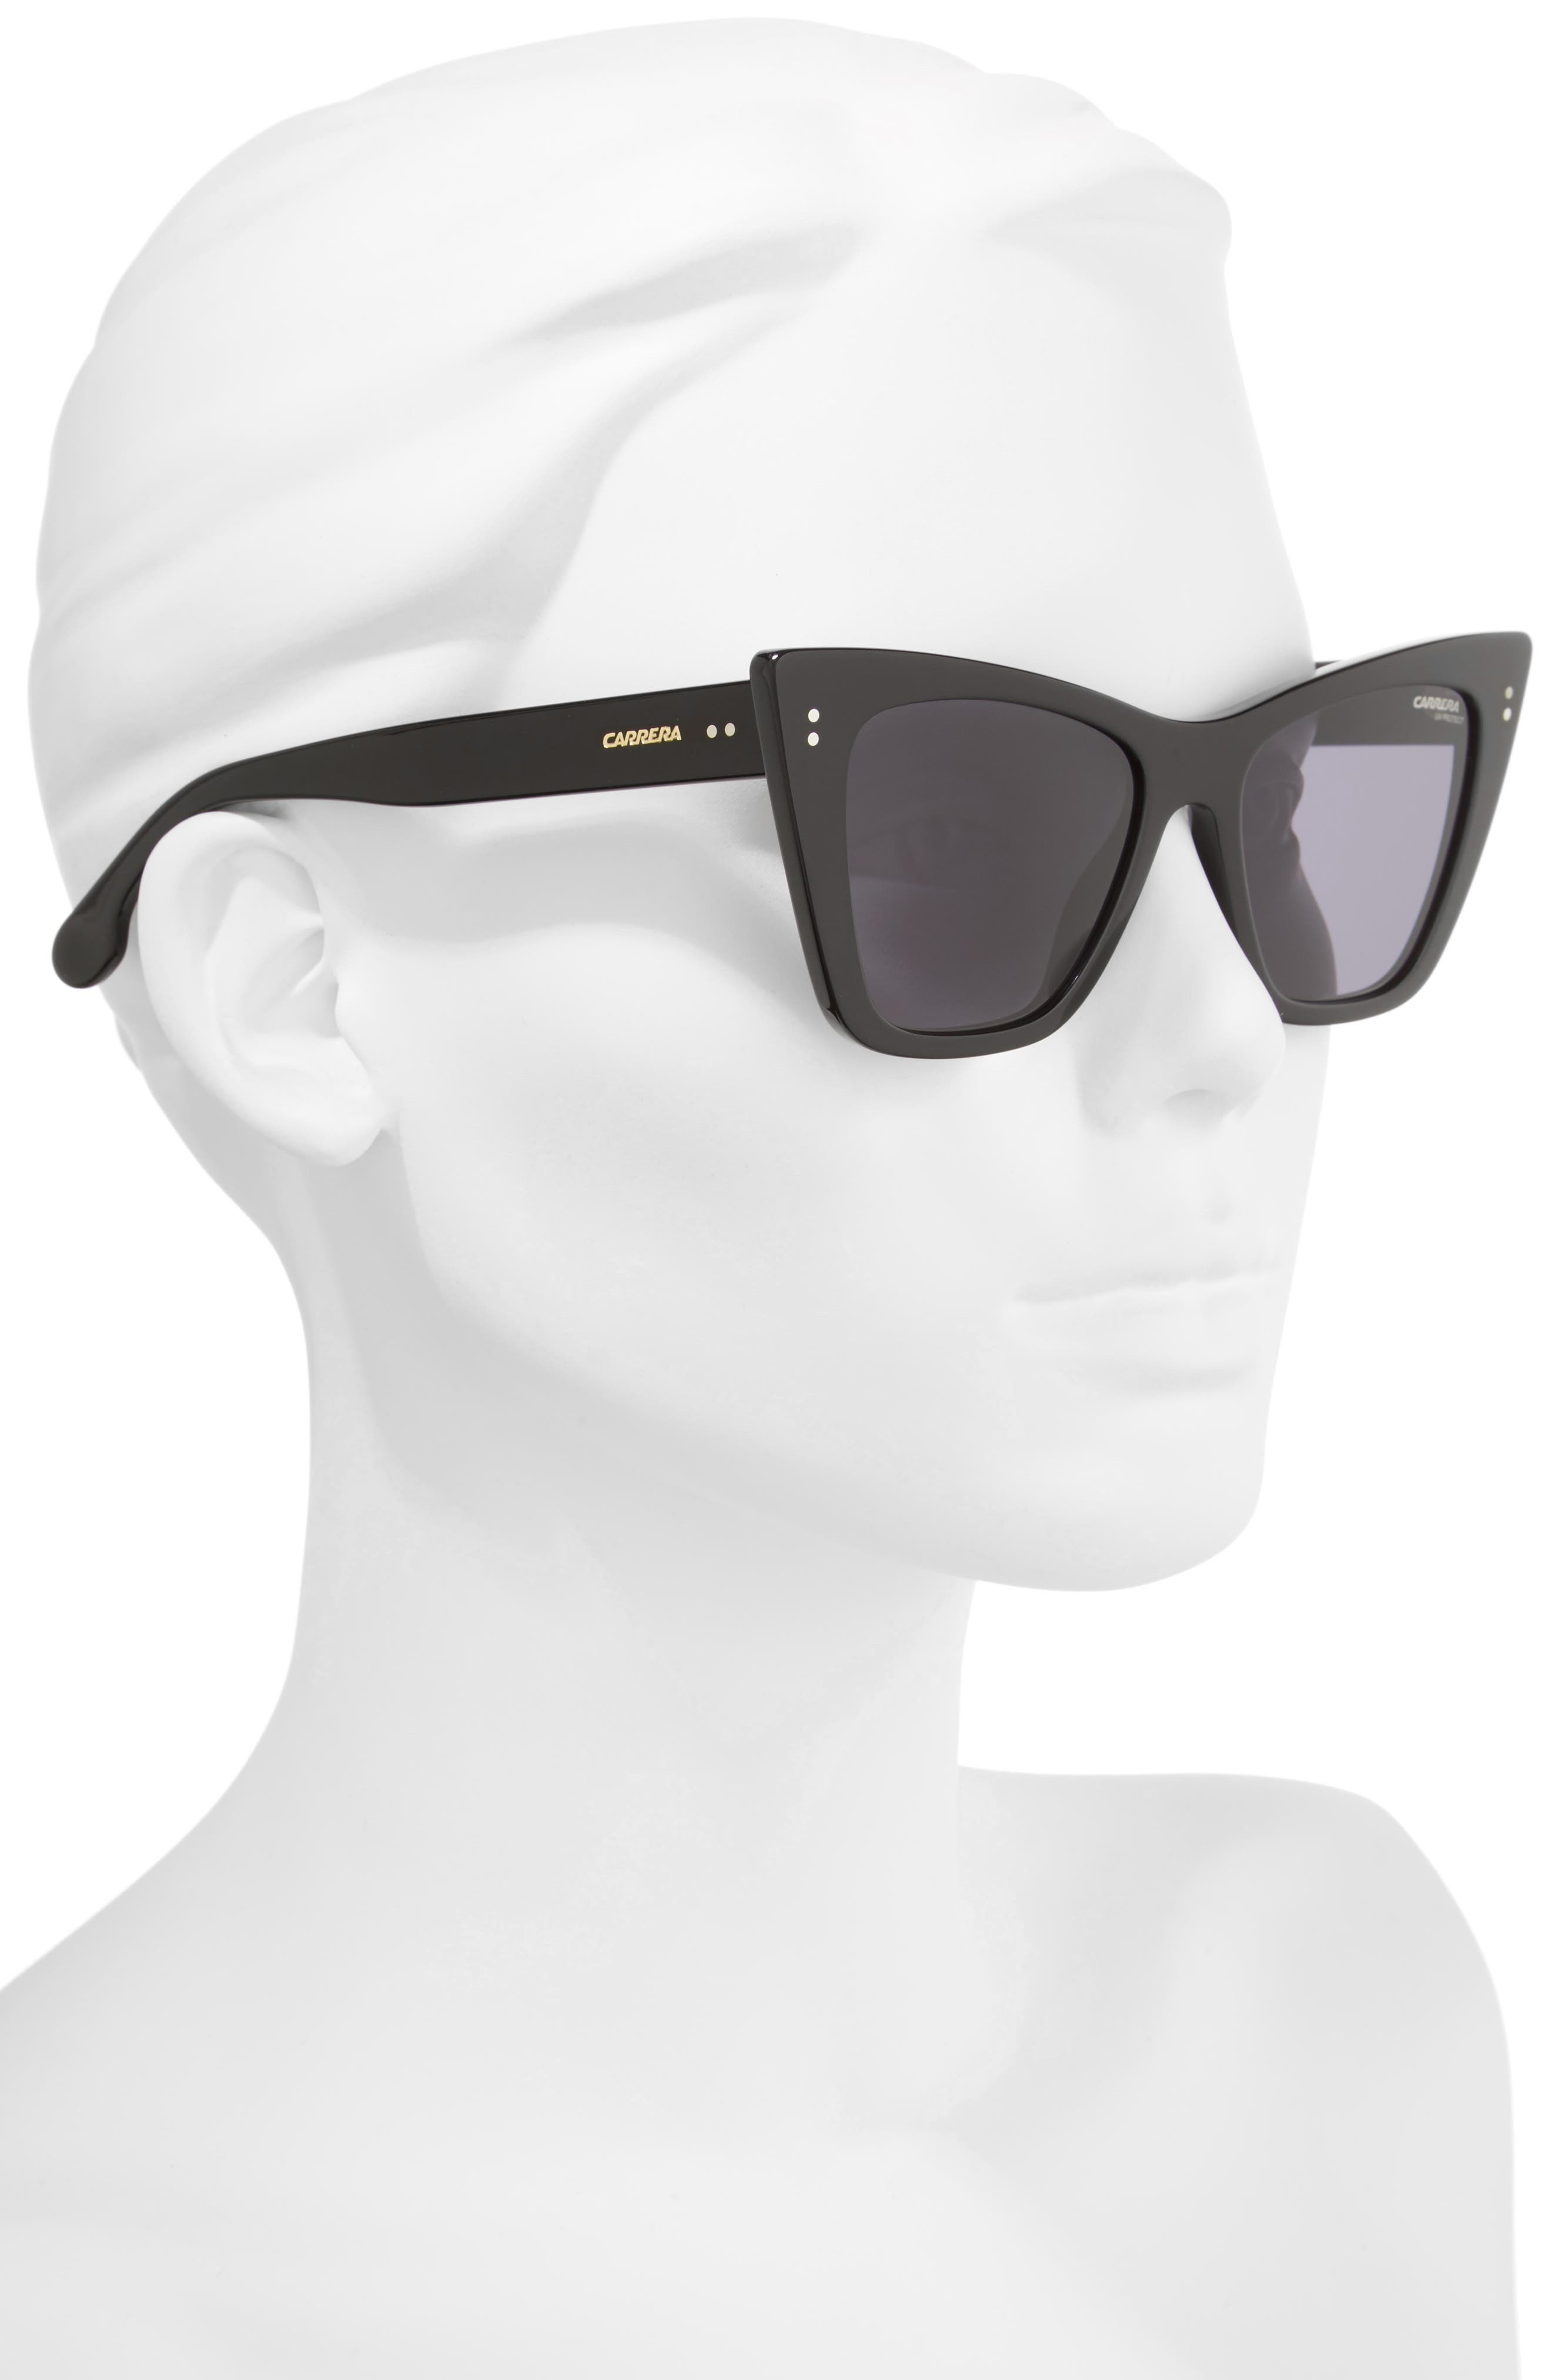 52mm Cat Eye Sunglasses,                             Alternate thumbnail 2, color,                             001